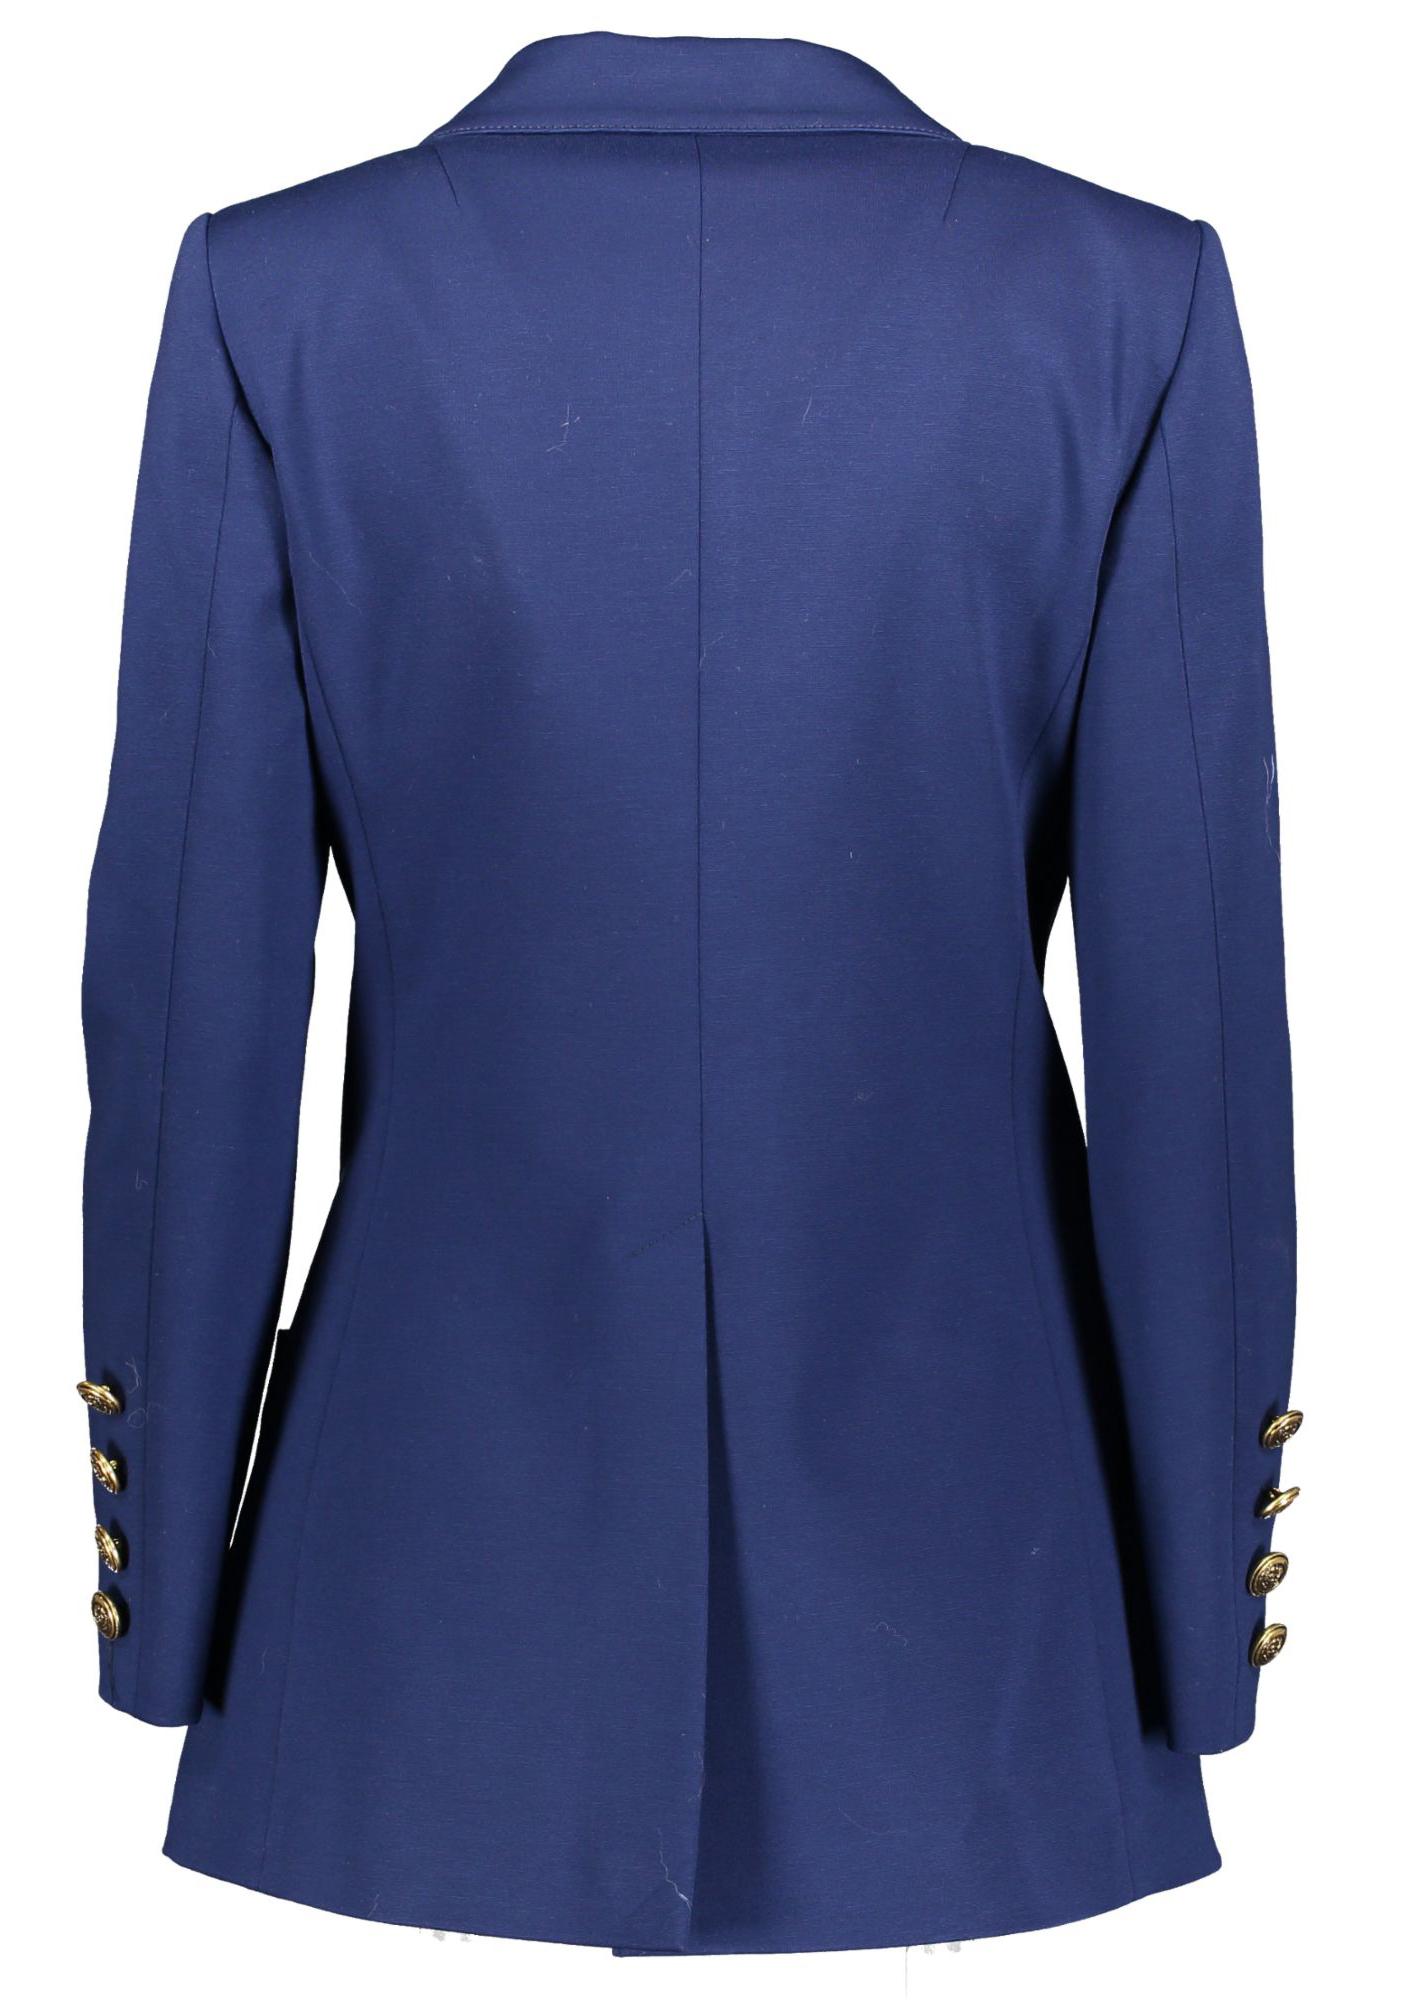 blazer blue back _Front_JPG2000x2000Fixed